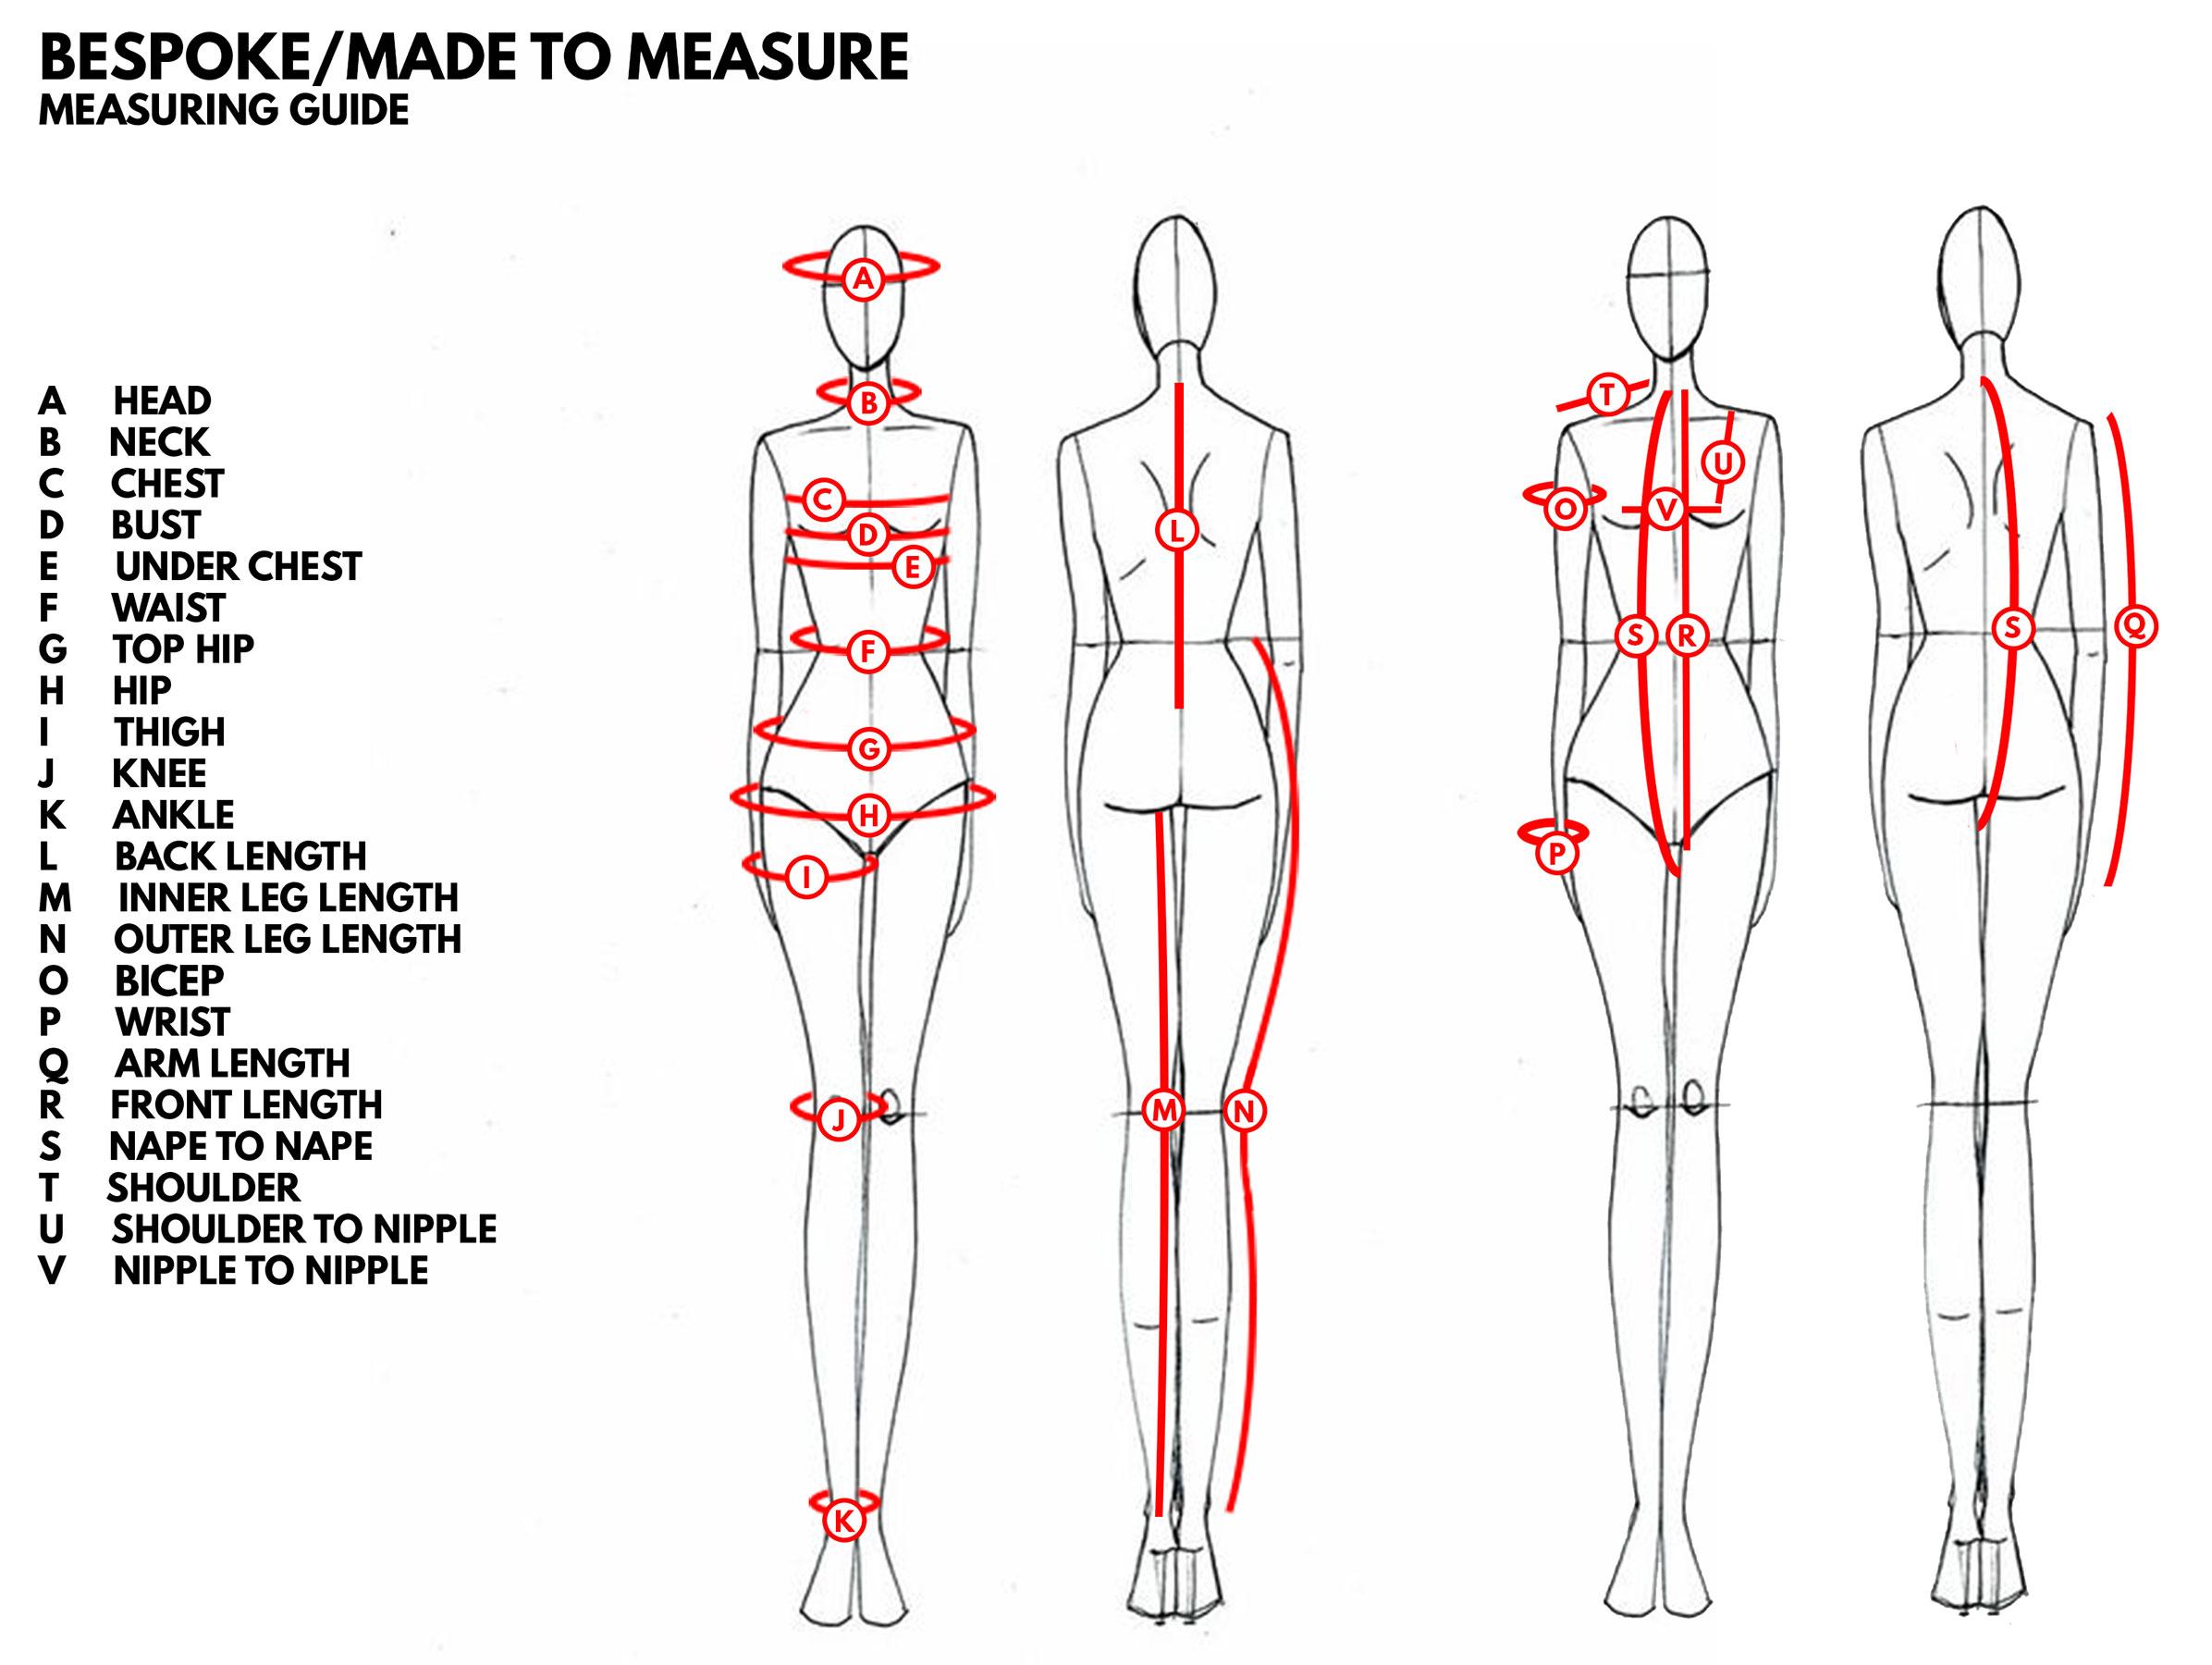 Bespoke Measuring Guide